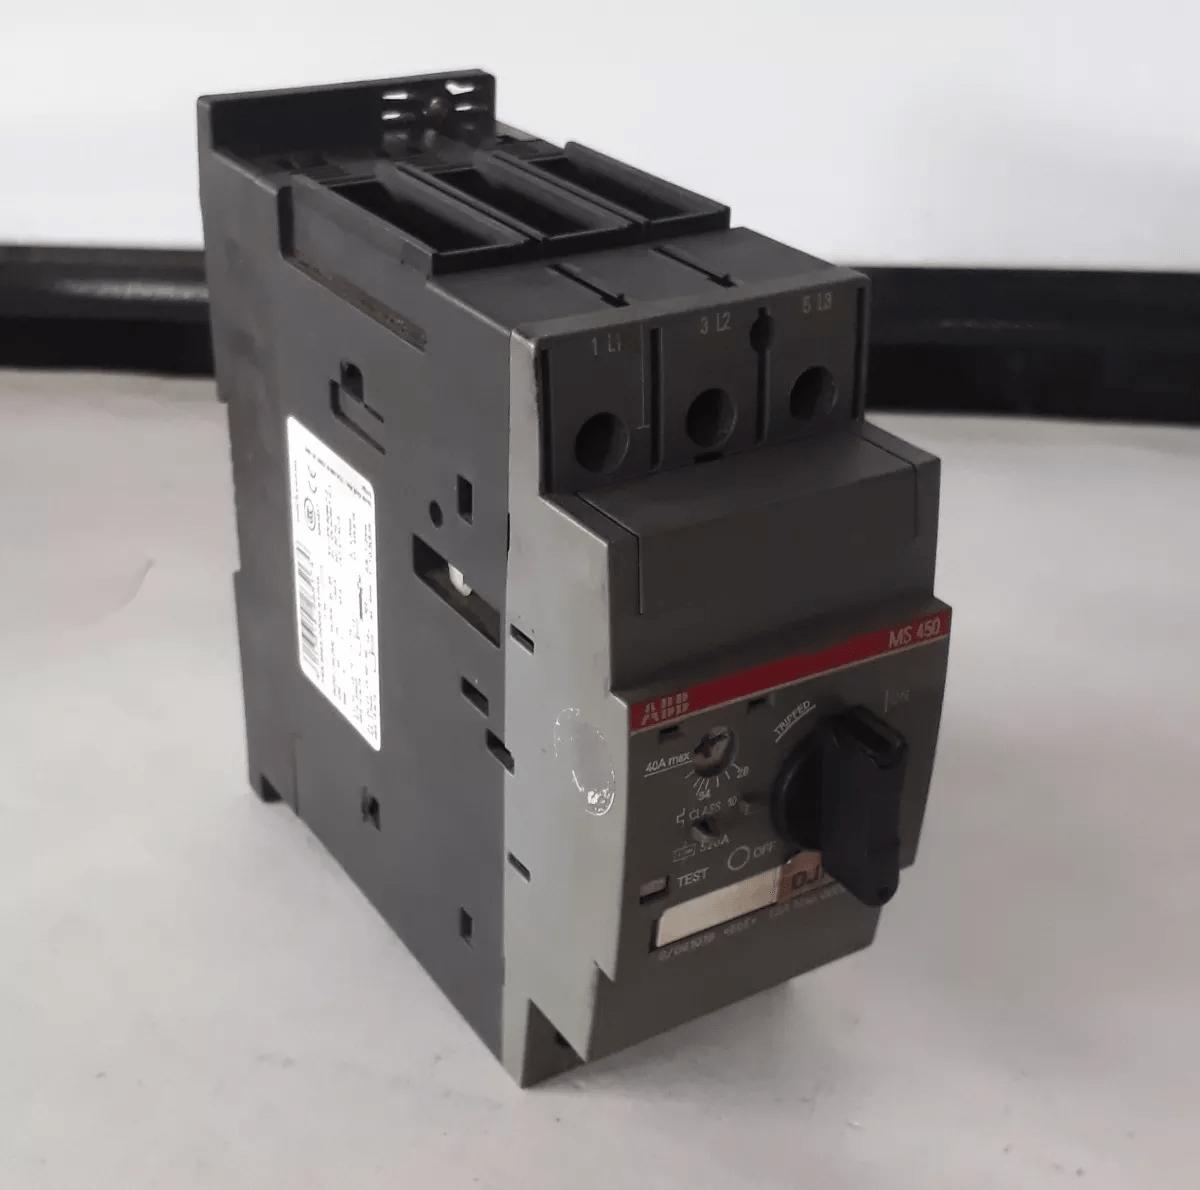 Disjuntor Motor Abb Ms450